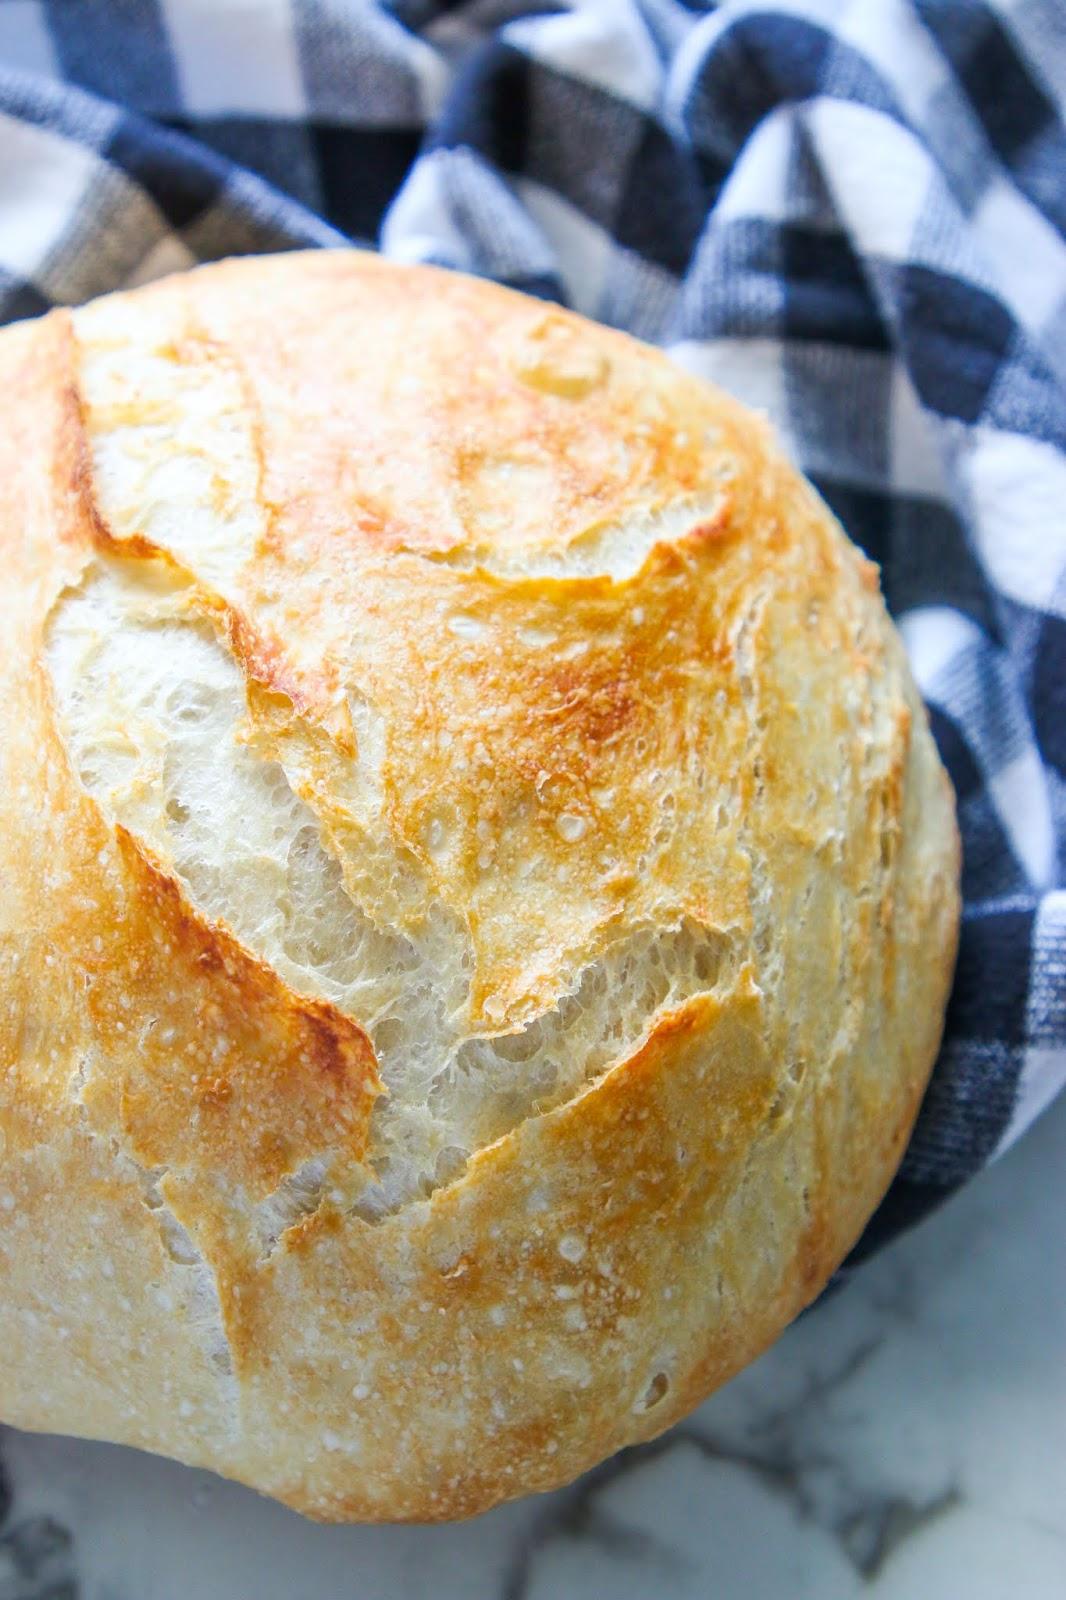 Hearty artisan bread recipe. No-knead artisan bread in five minutes. Soft artisan bread recipe. Easy bread recipe. Easiest homemade bread recipe. Homemade bread for beginners. How to make homemade bread. Pantry recipes. Easy pantry recipes. Basic kitchen recipes. Bread baking for beginners. #bread #breadmaking #breadmachine #artisanbread #pandemic #foodstorage #prepper #emergencyessentials #recipes #bread